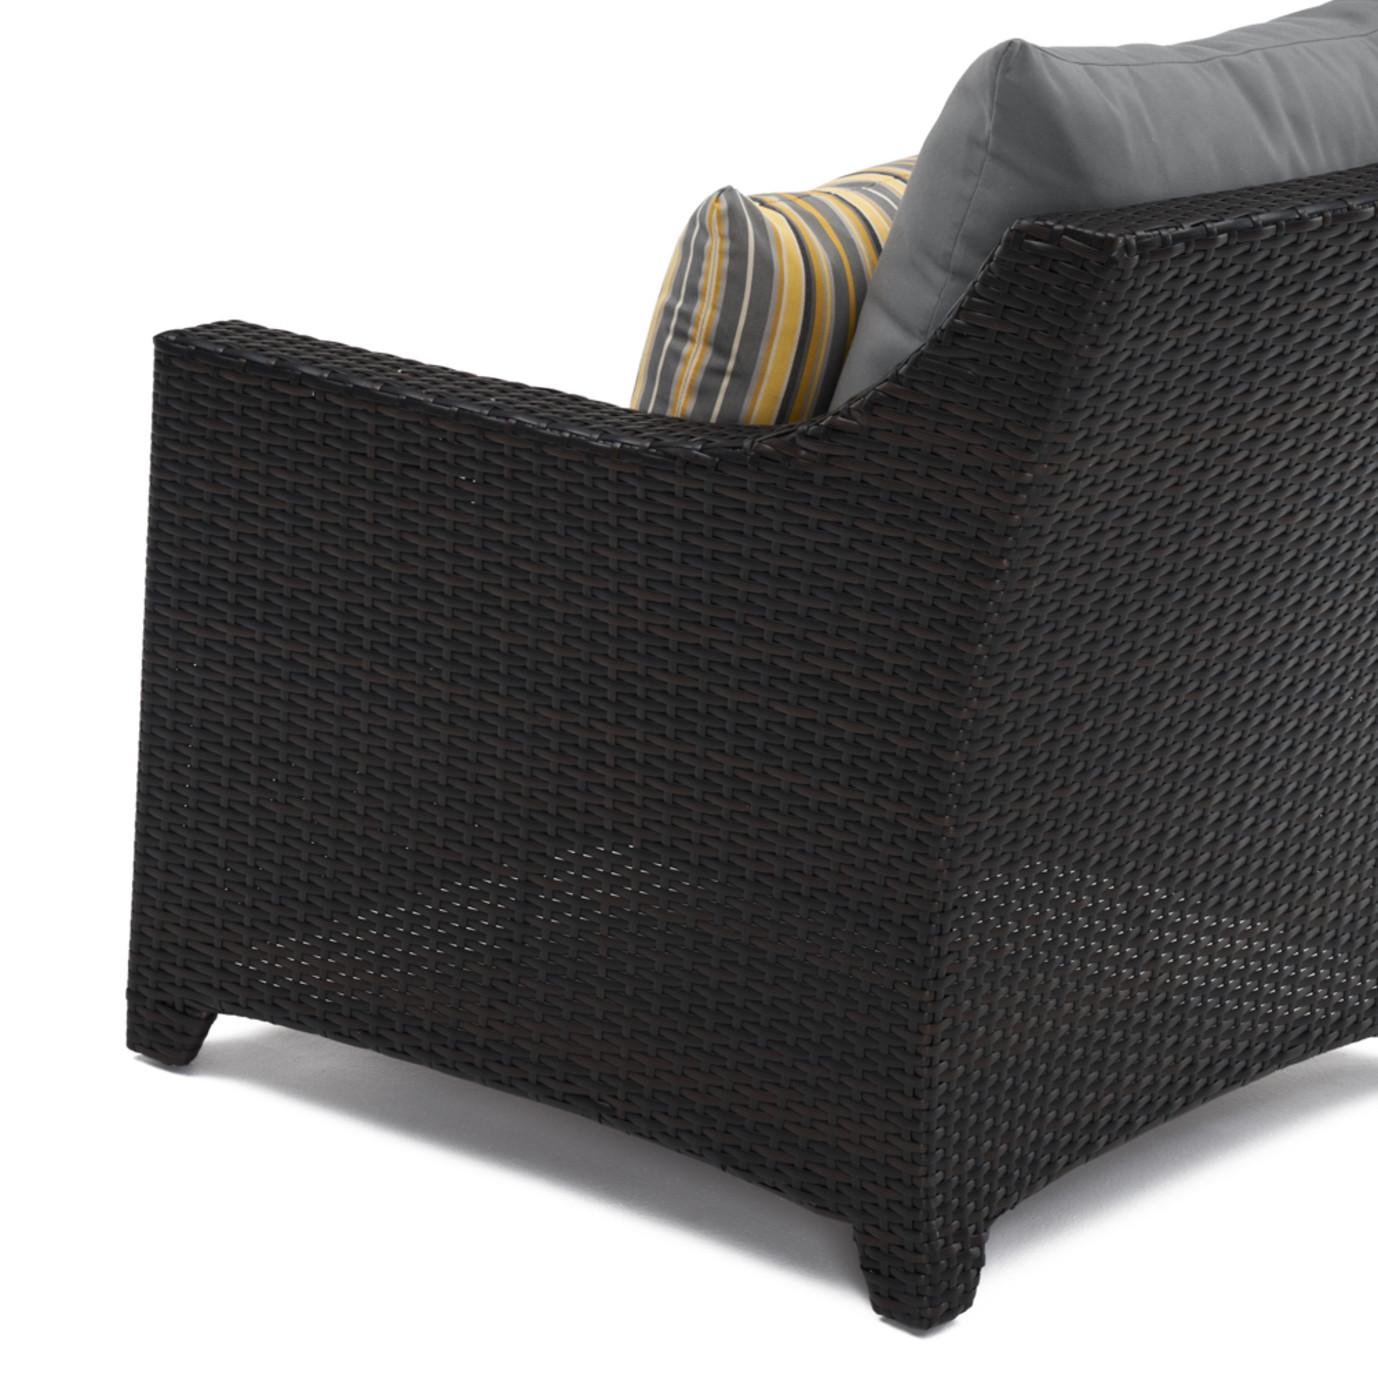 Deco™ Sofa - Charcoal Gray